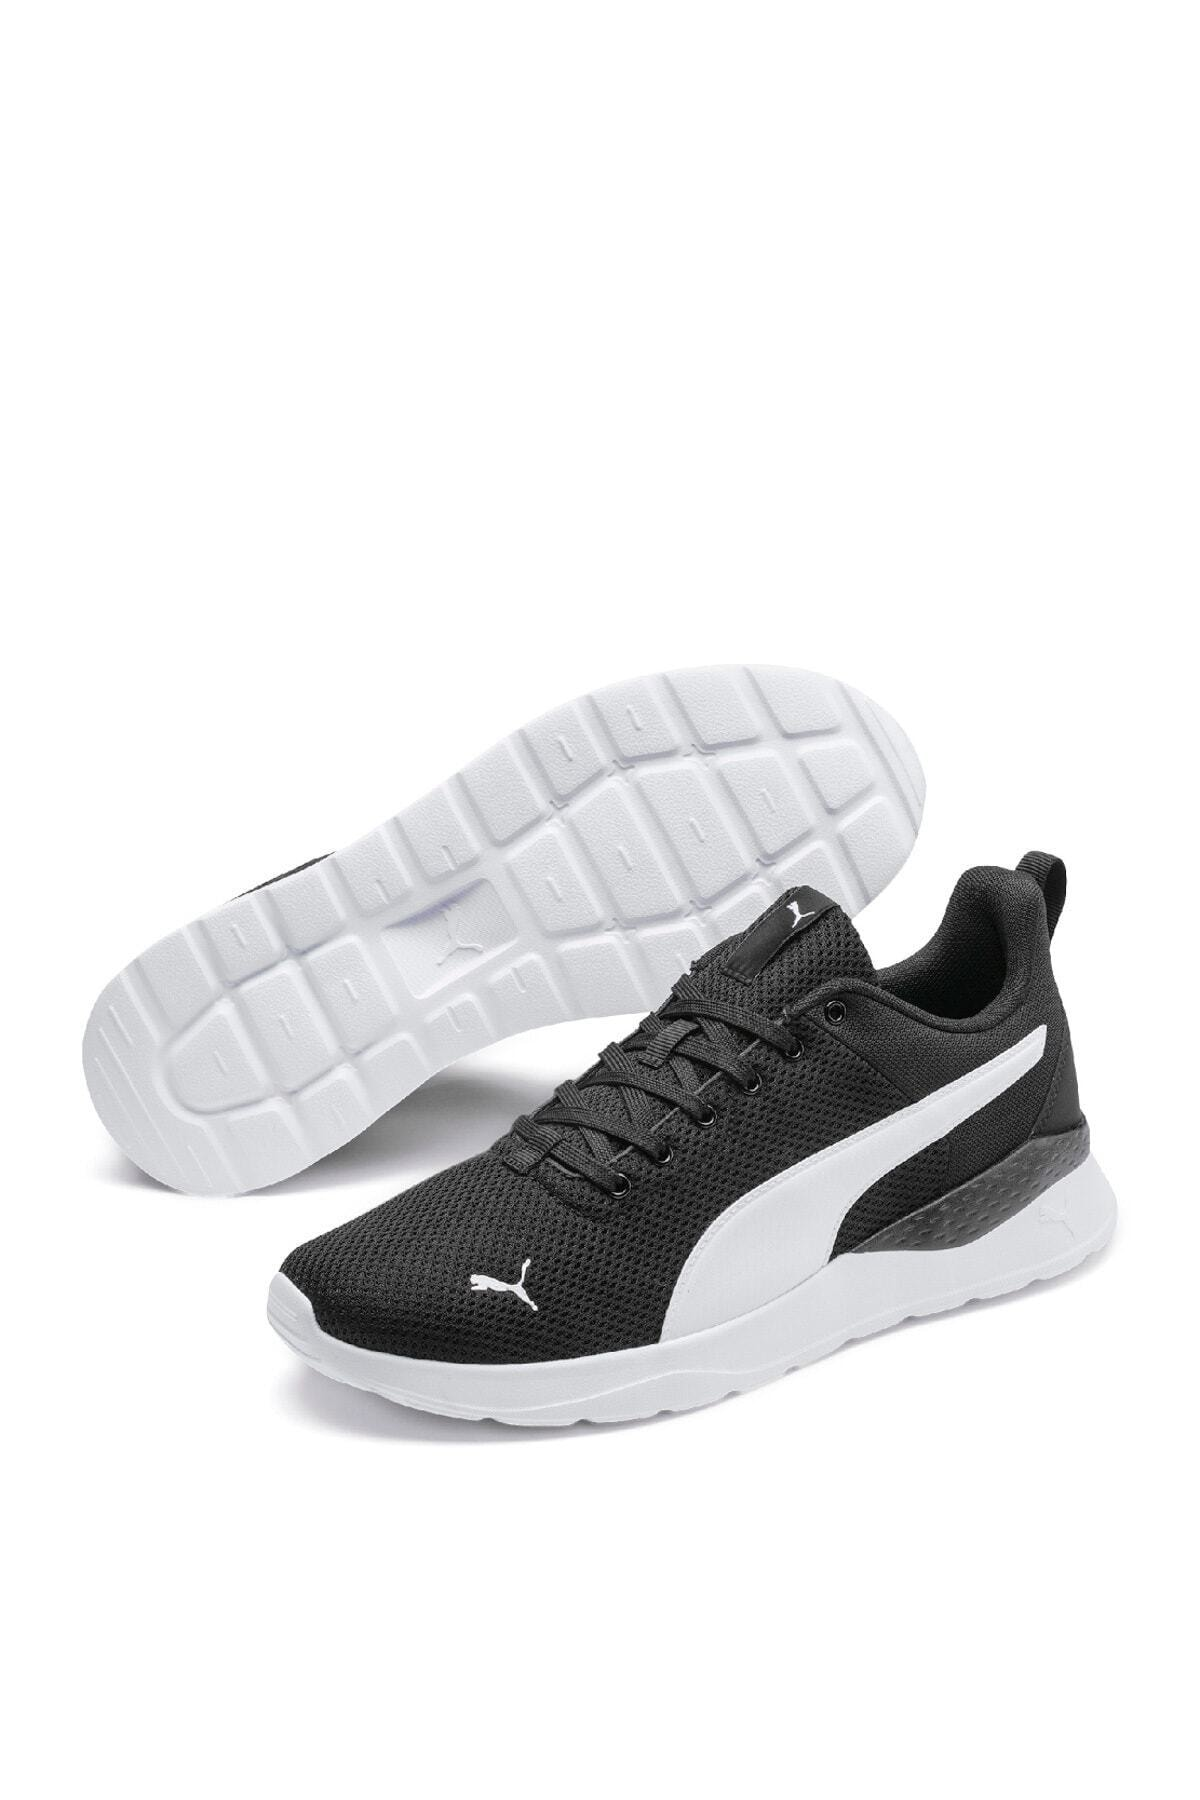 Puma ANZARUN LITE Siyah Erkek Koşu Ayakkabısı 100644556 1